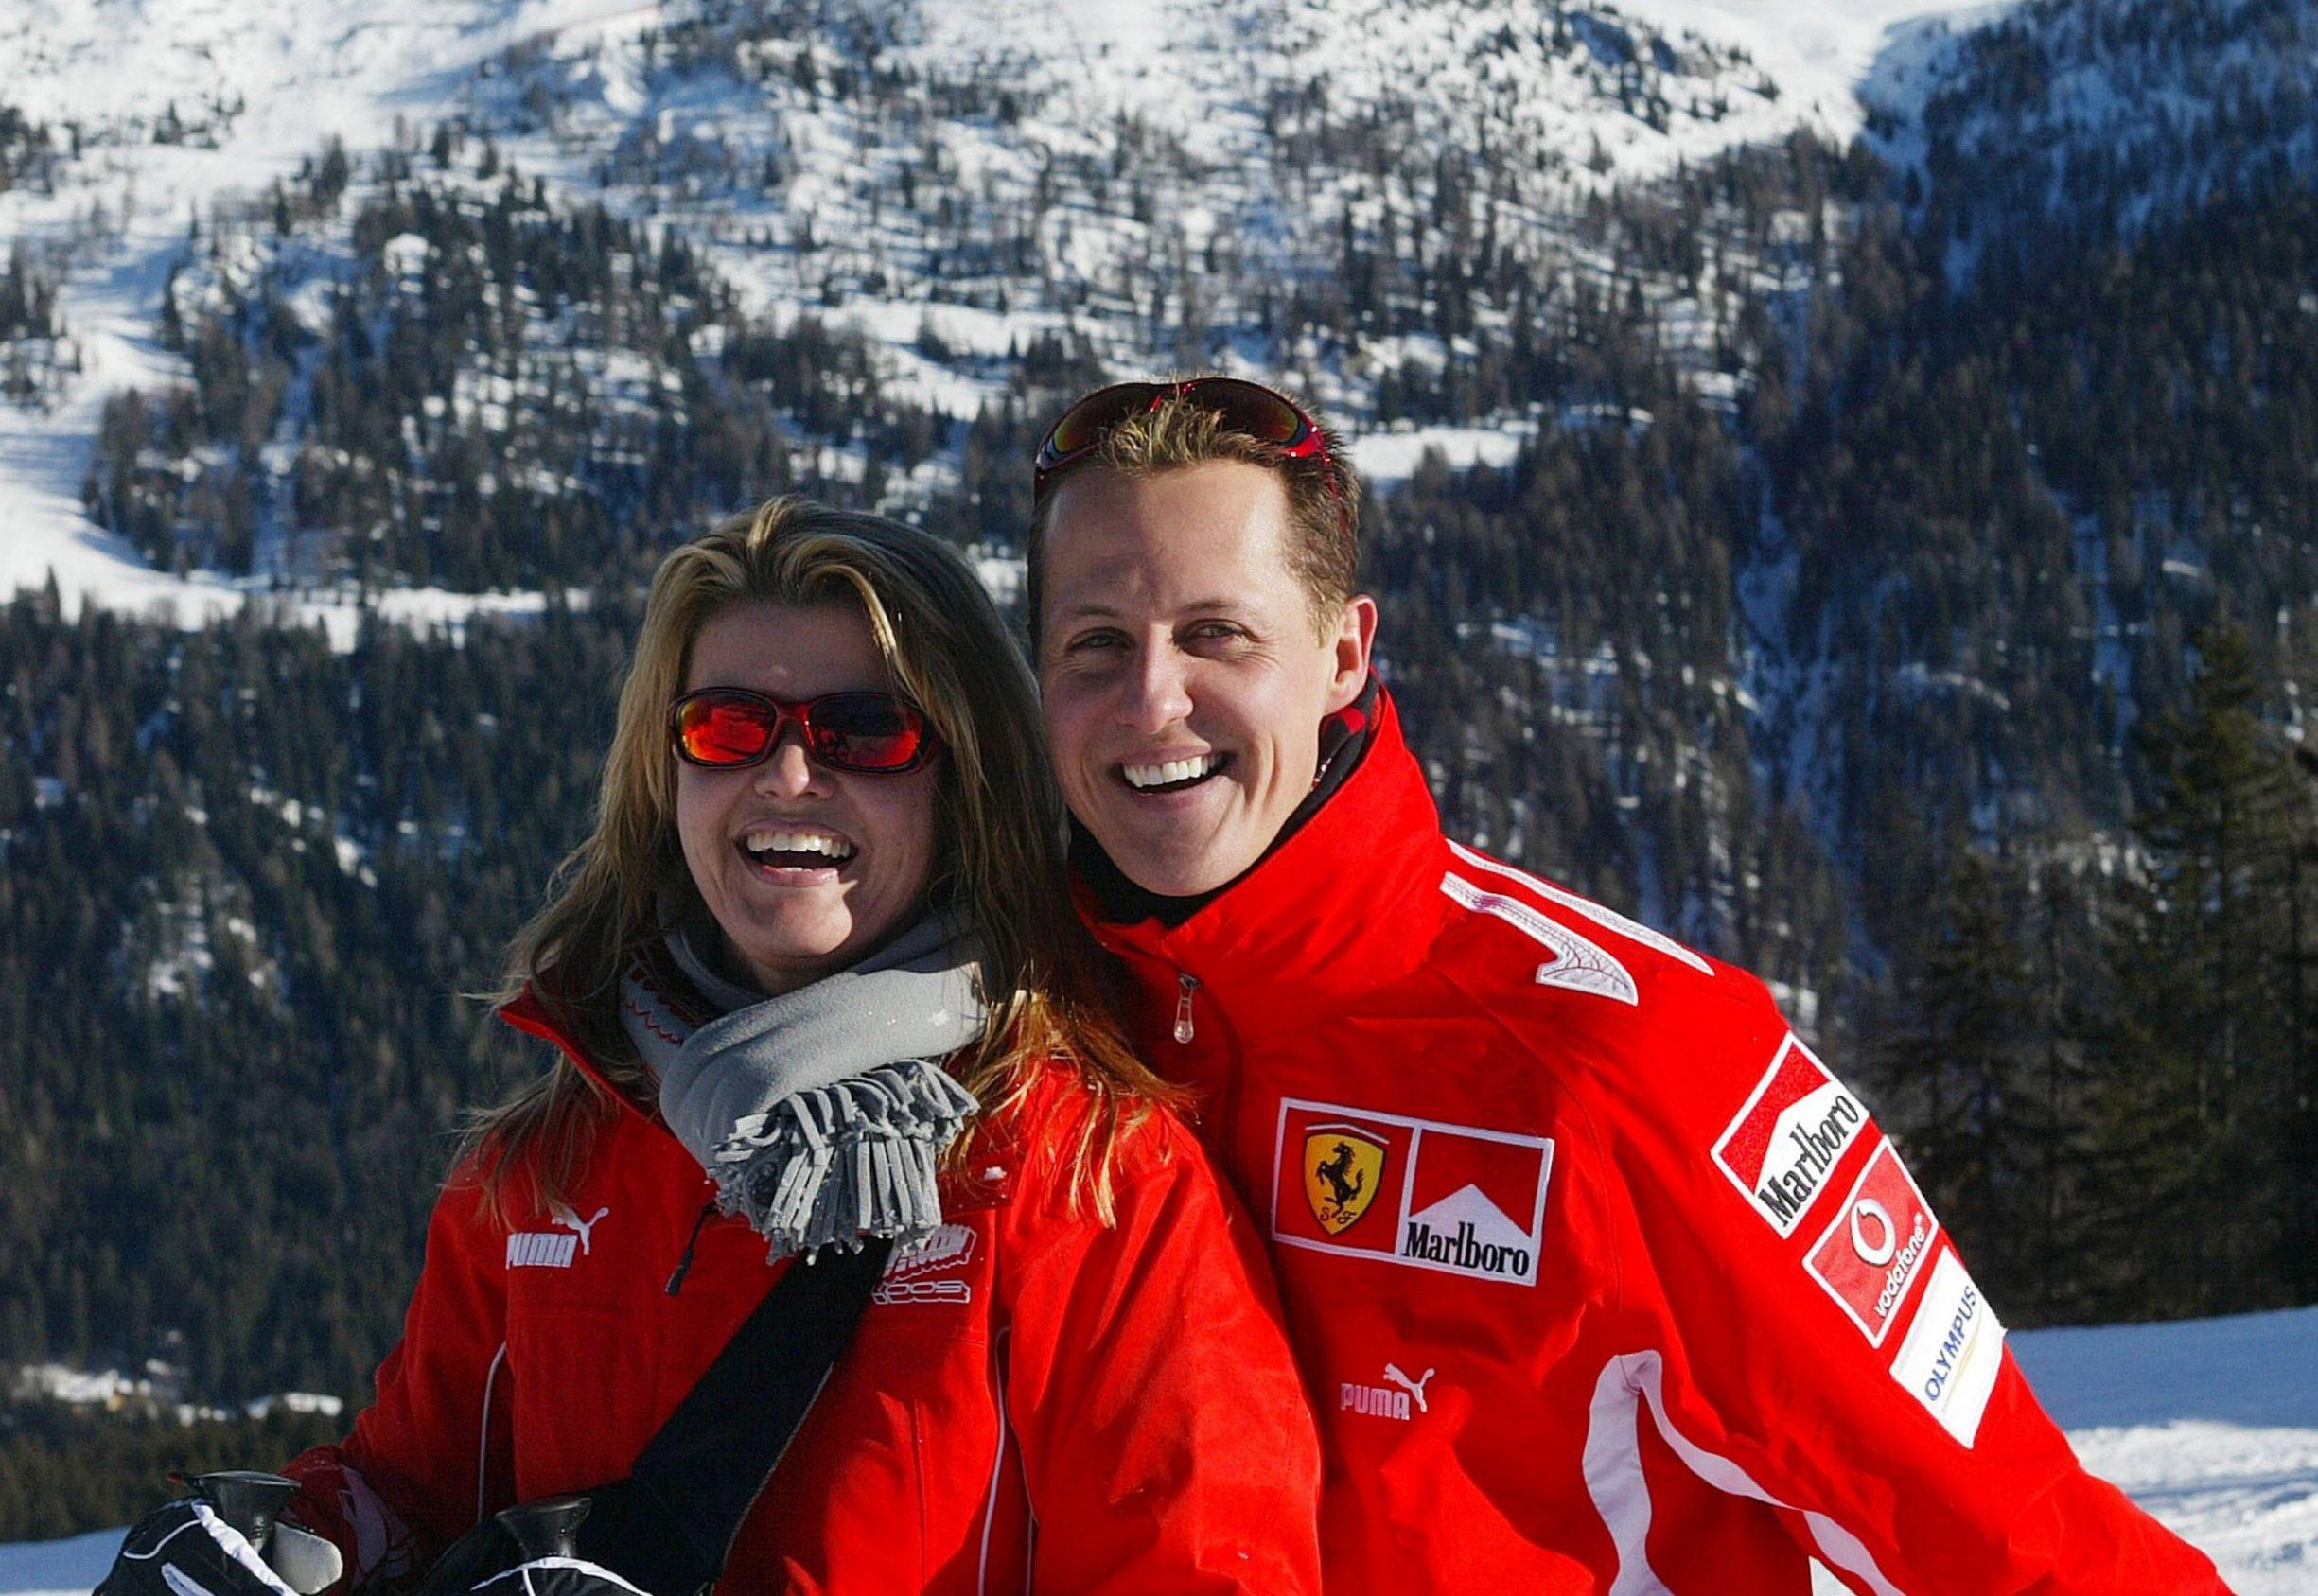 Mandatory Credit: Photo by Cesare Galimberti/REX/Shutterstock (508808c) Michael Schumacher and wife Corinna FERRARI FORMULA 1 PRESS CONFERENCE, MADONNA DI CAMPIGLIO, ITALY - 11 JAN 2005